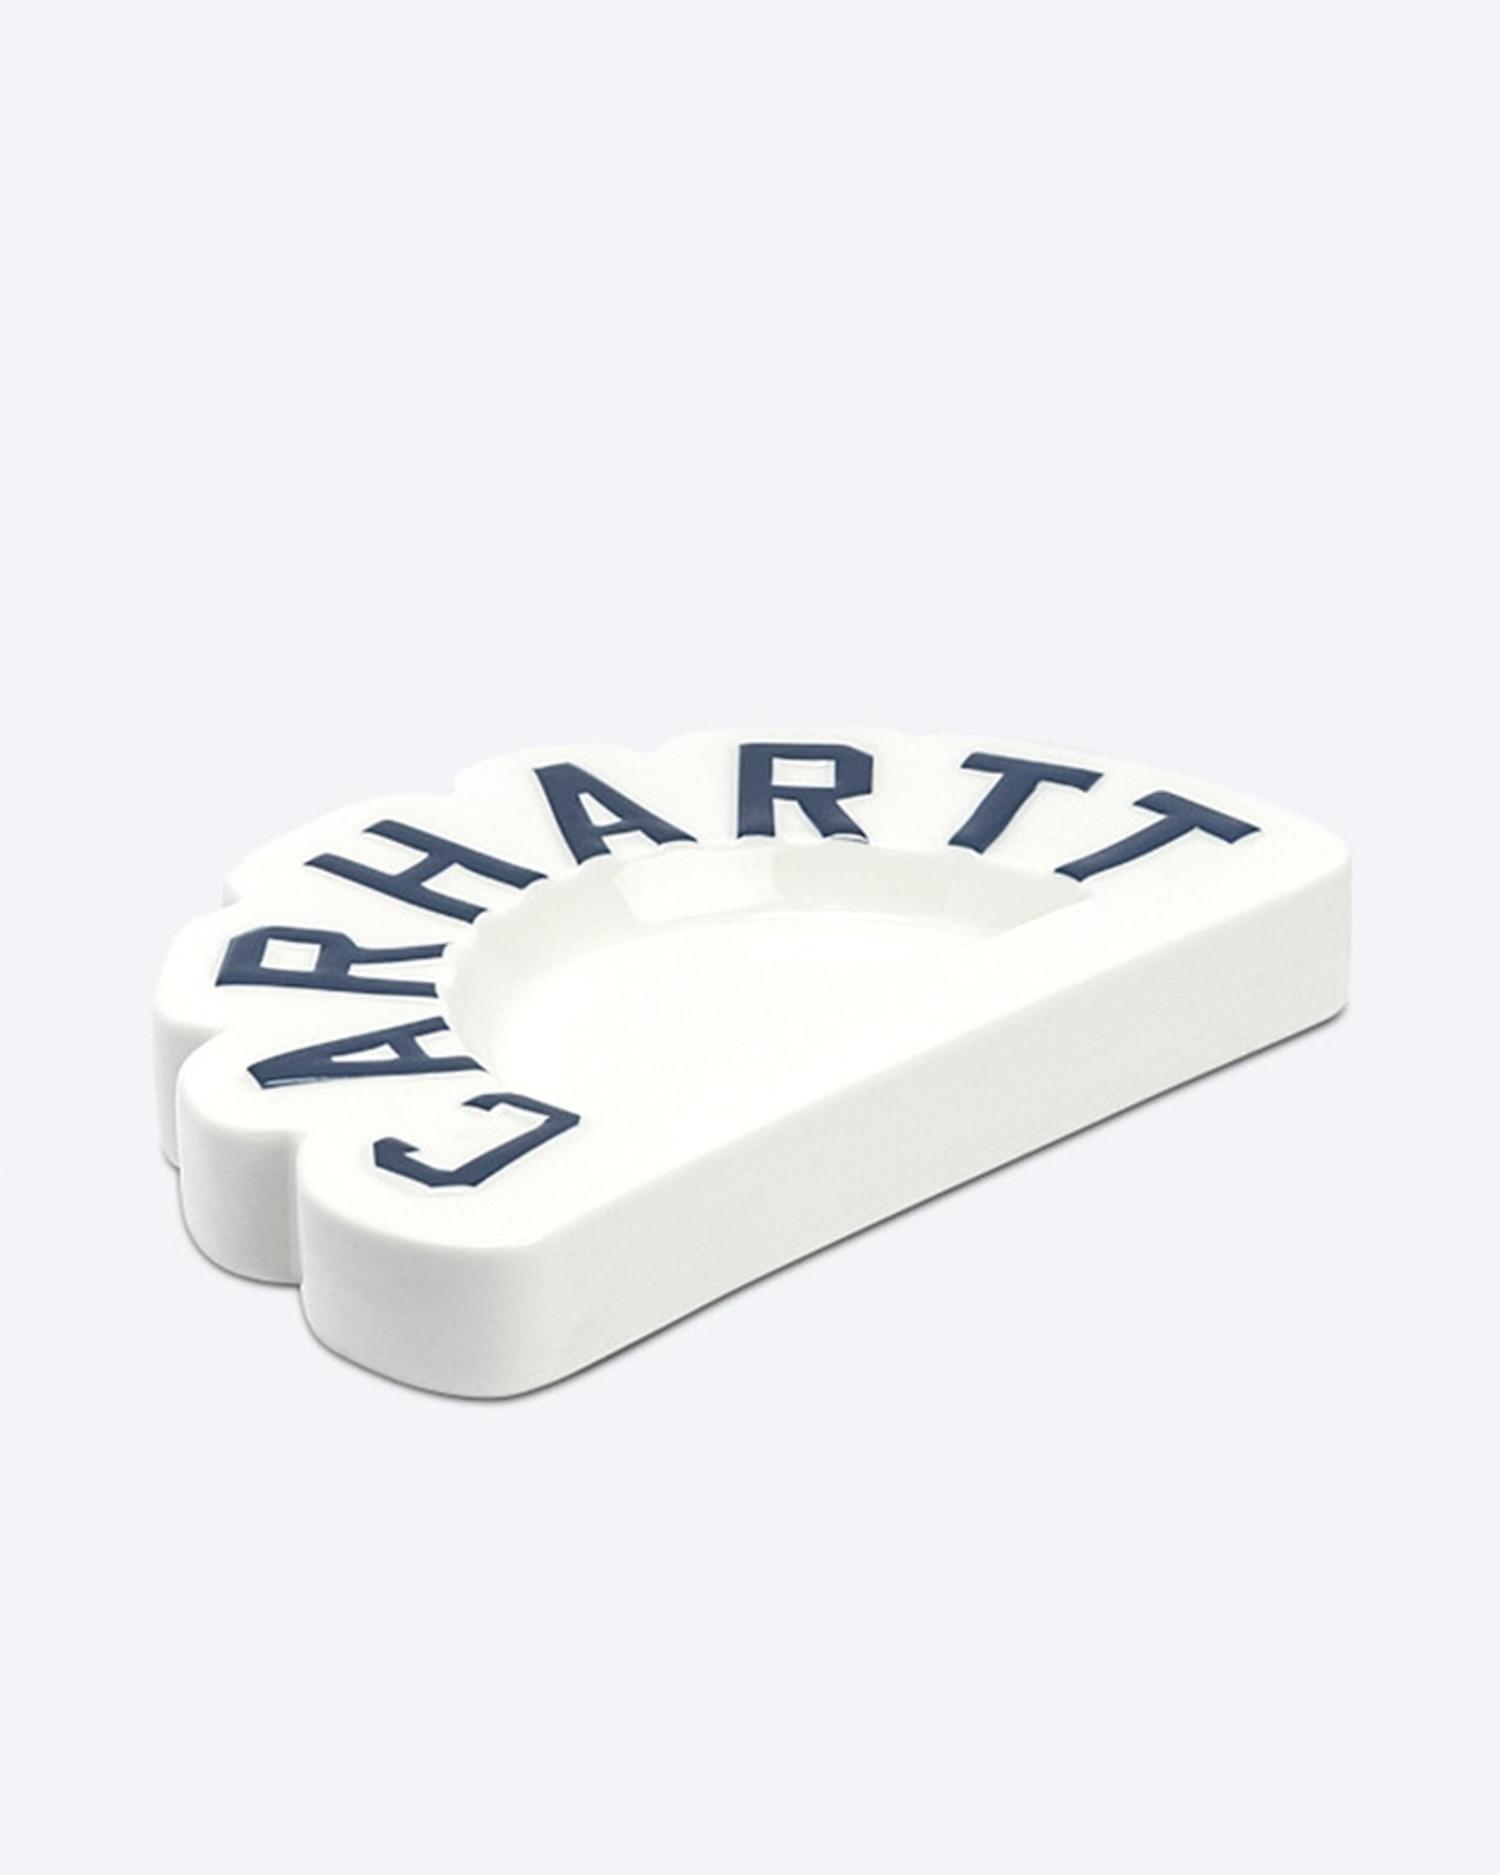 Carhartt Arch Porcelain Ashtray White/Navy